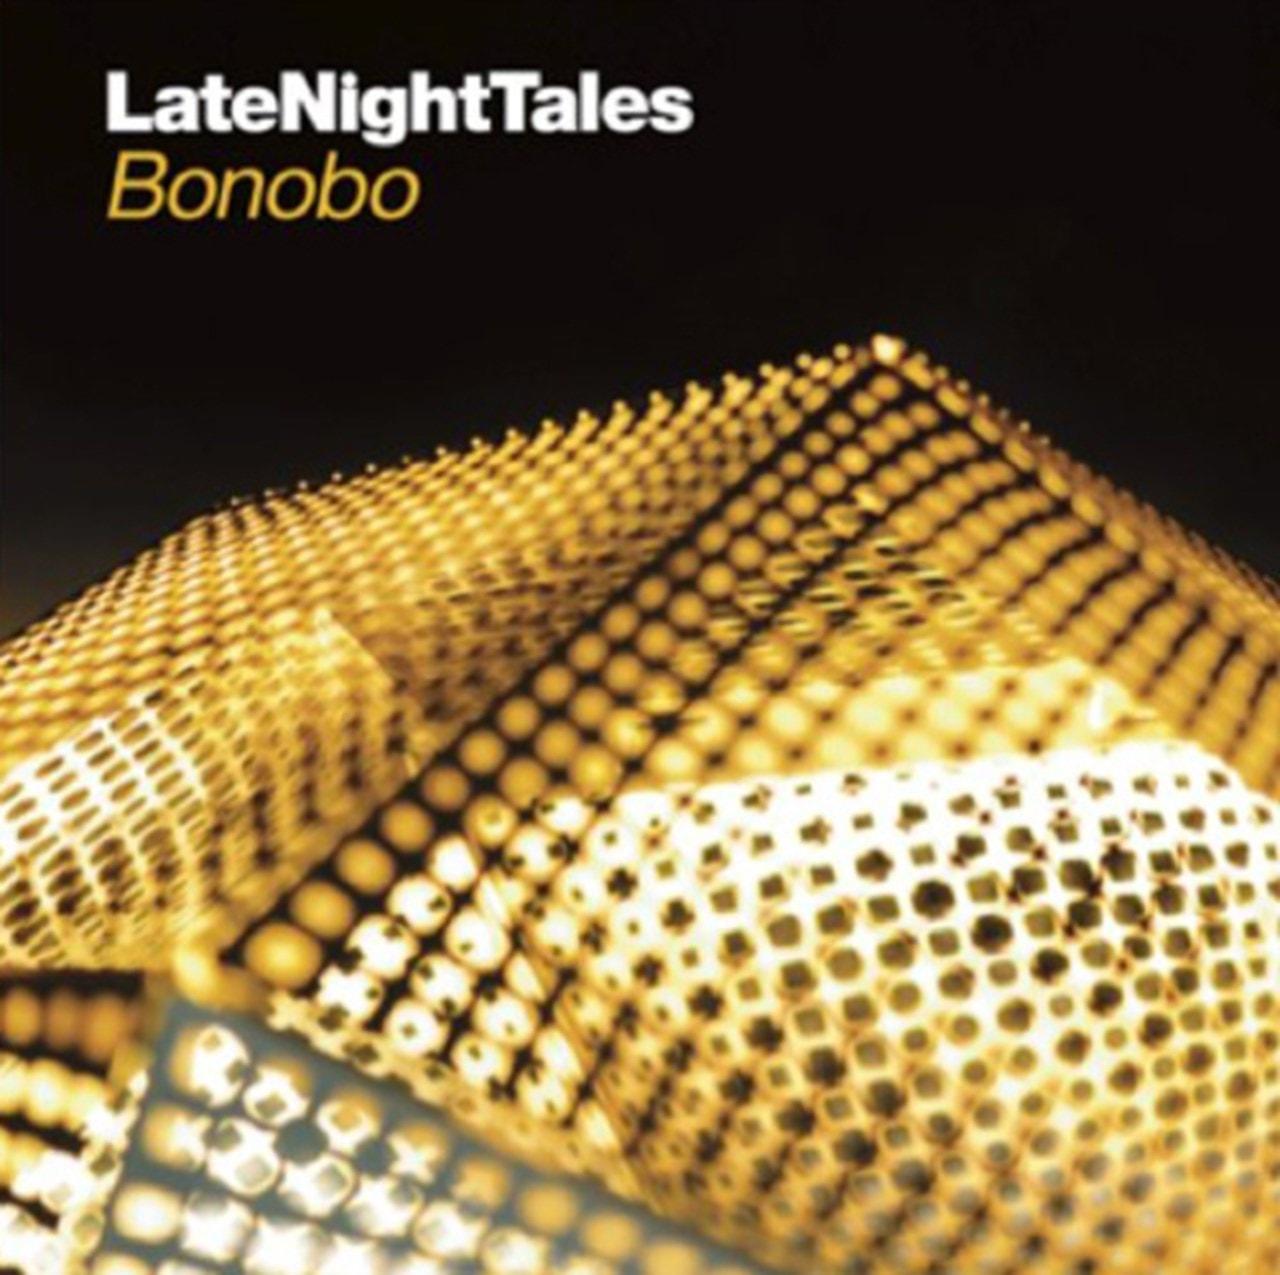 Late Night Tales: Bonobo - 1